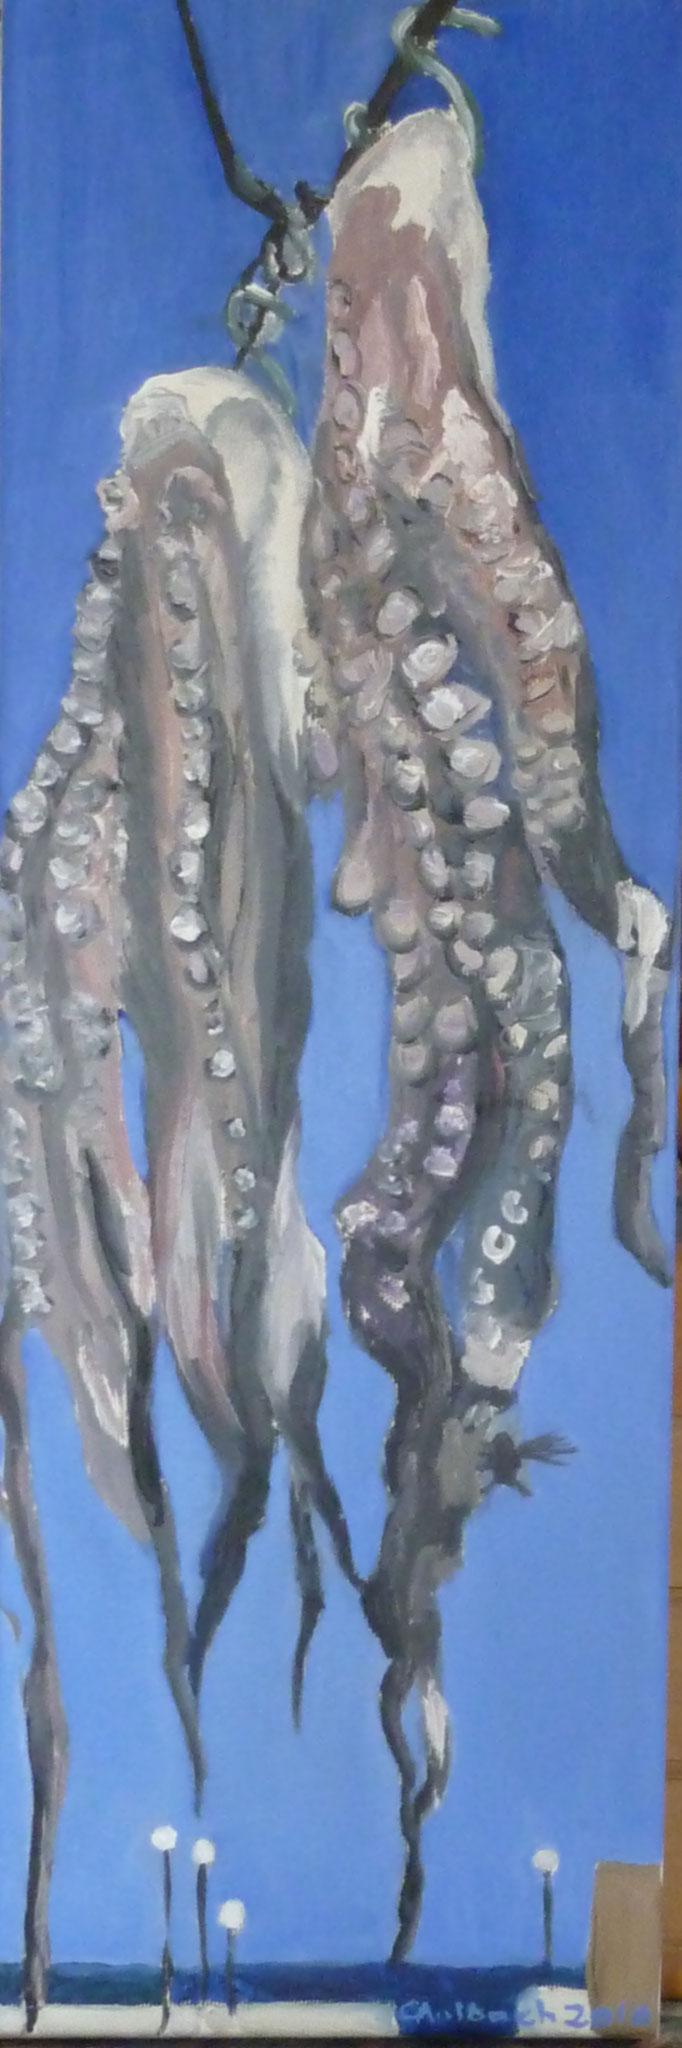 Octopus, 2010, 60 x 20cm, Öl auf Leinwand